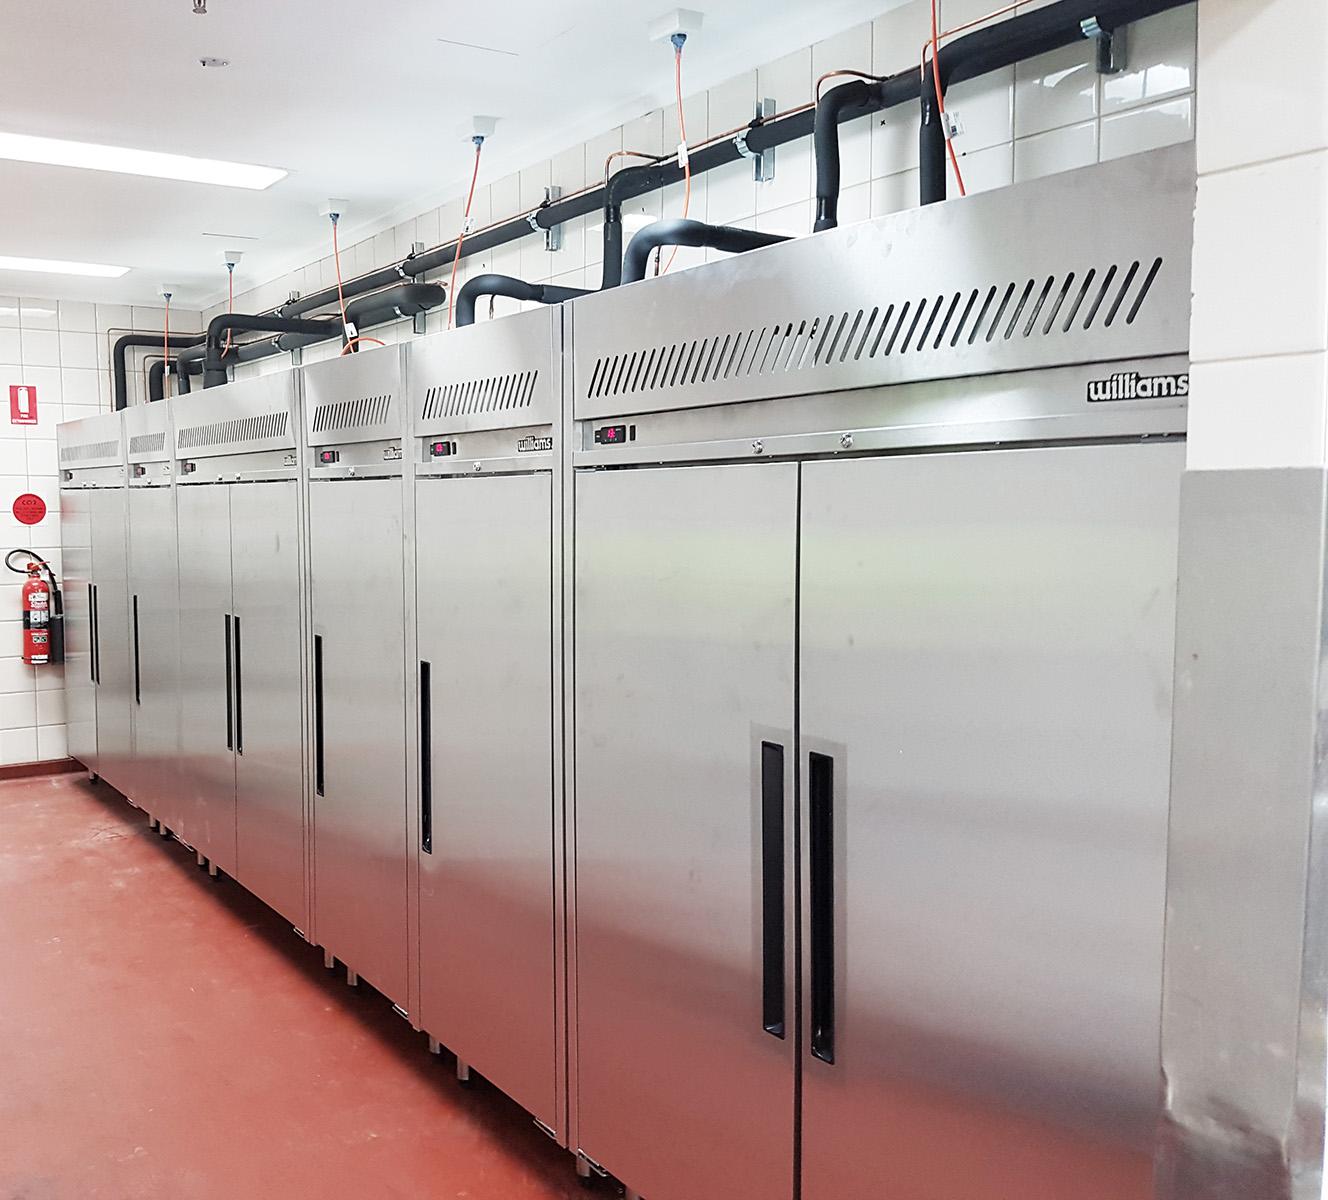 Hotel_Upright_Freezer_Cabinets_Remote_Refrigeration.jpg